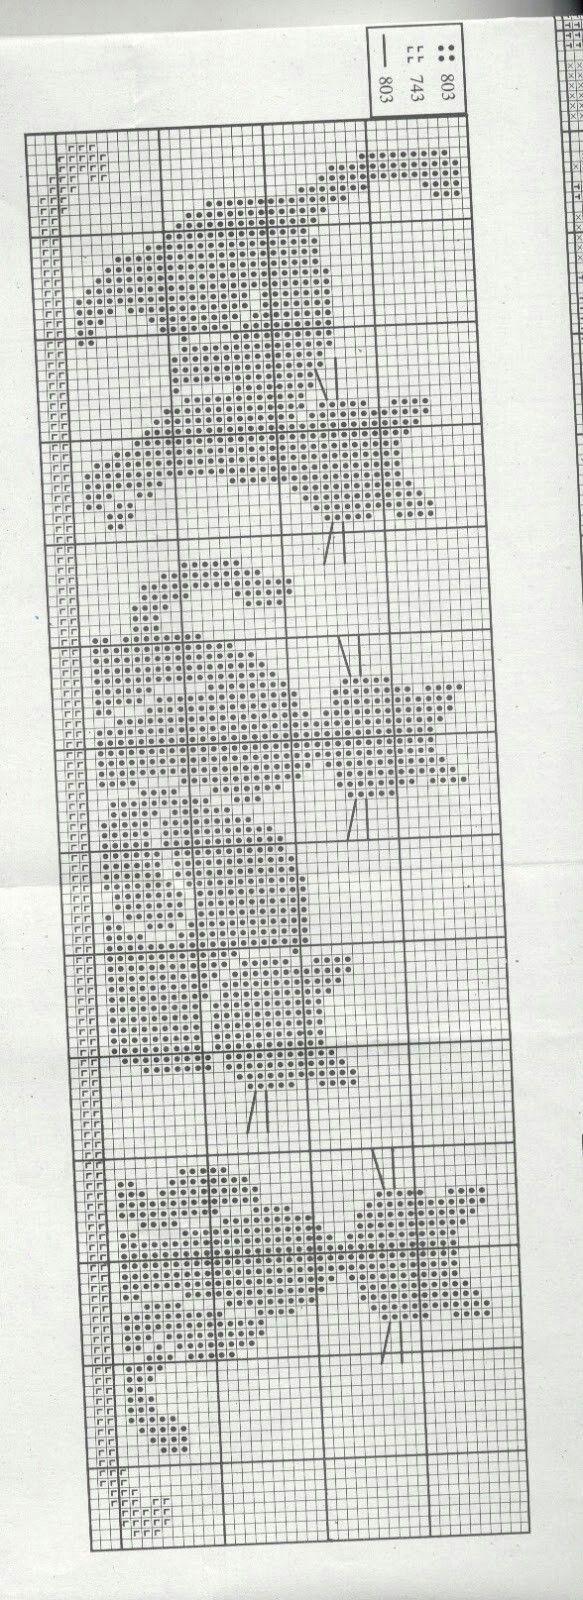 Free Sampler Patterns | Needlework | Pinterest | Patterns, Cat and ...